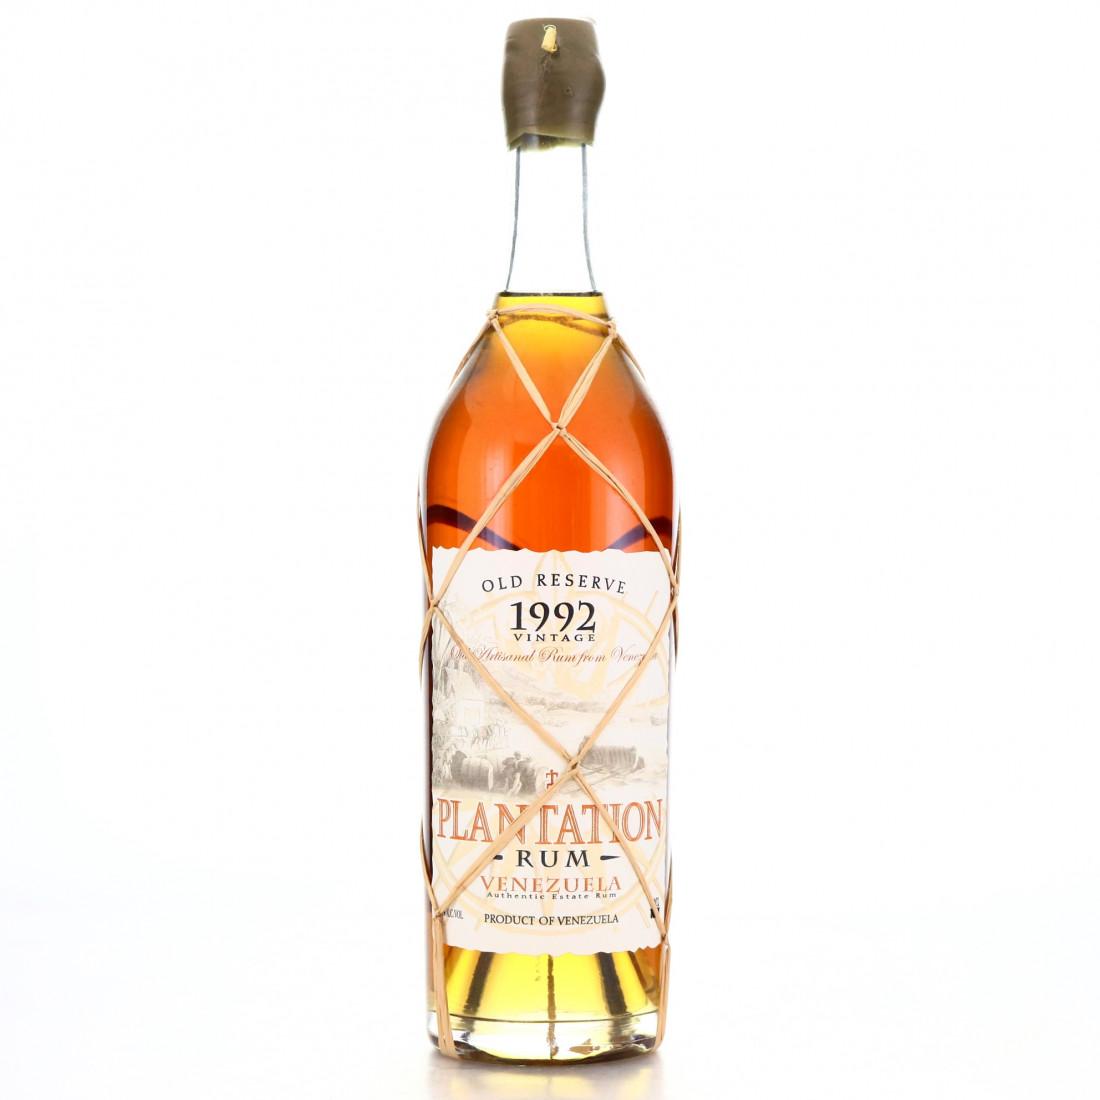 Venezuela Rum 19992 Plantation Old Artisanal